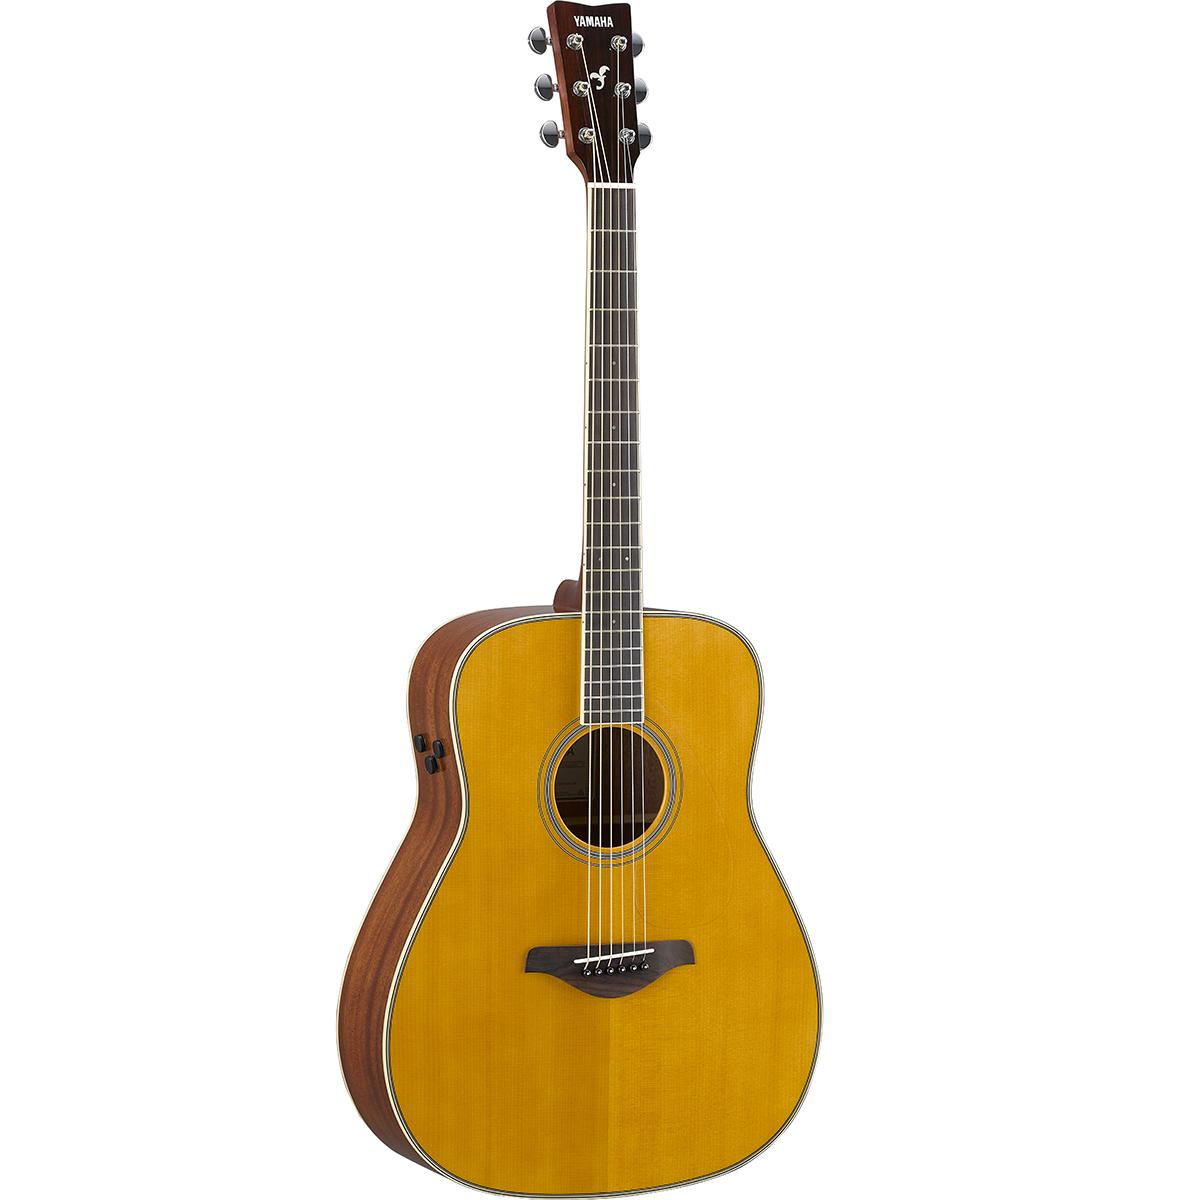 Yamaha - Guitare TransAcoustic FG-TA - Vintage